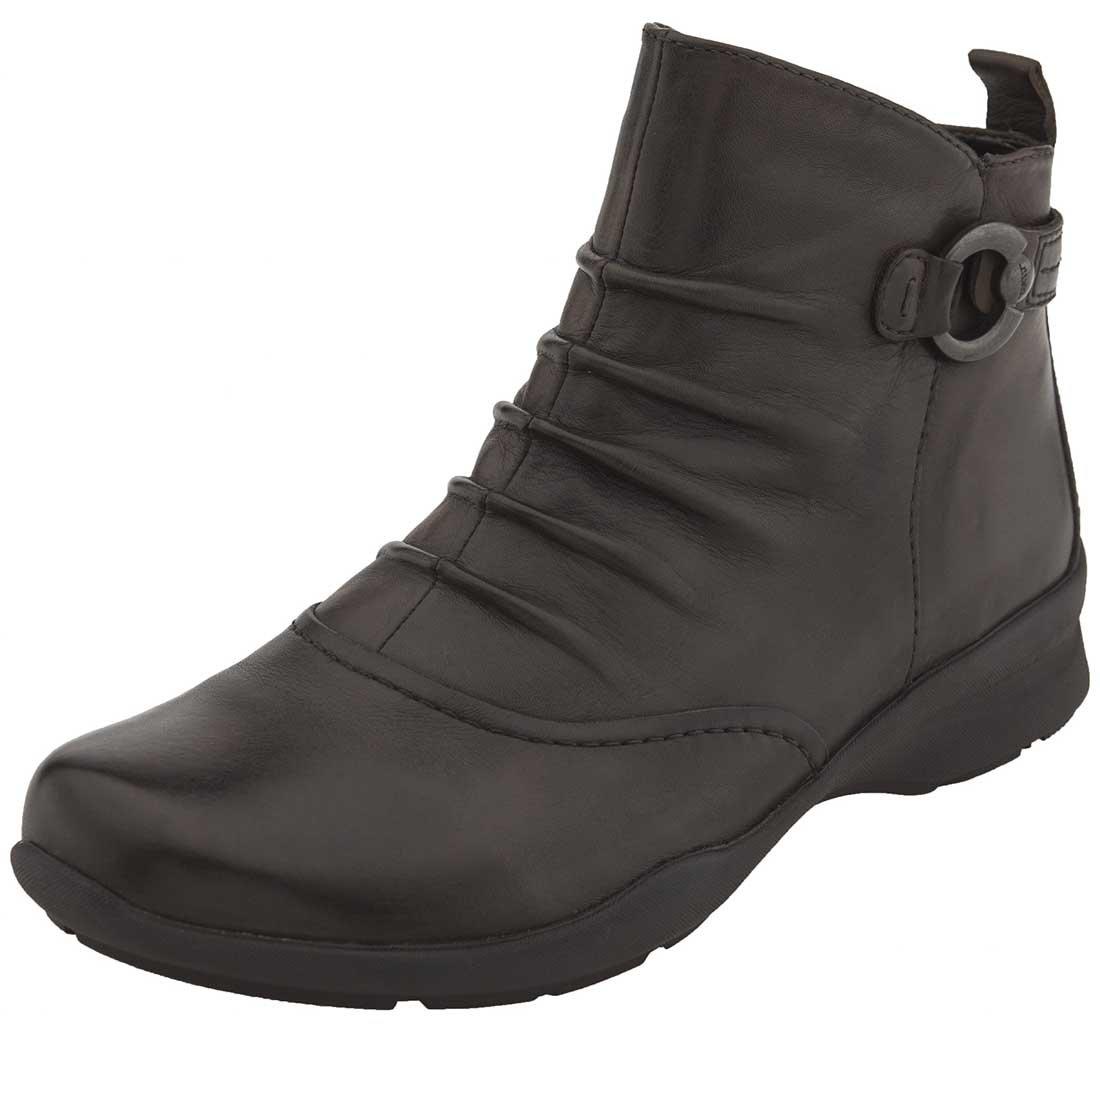 Earth Women's Alta Boot B06WWG9767 11 B(M) US|Bark